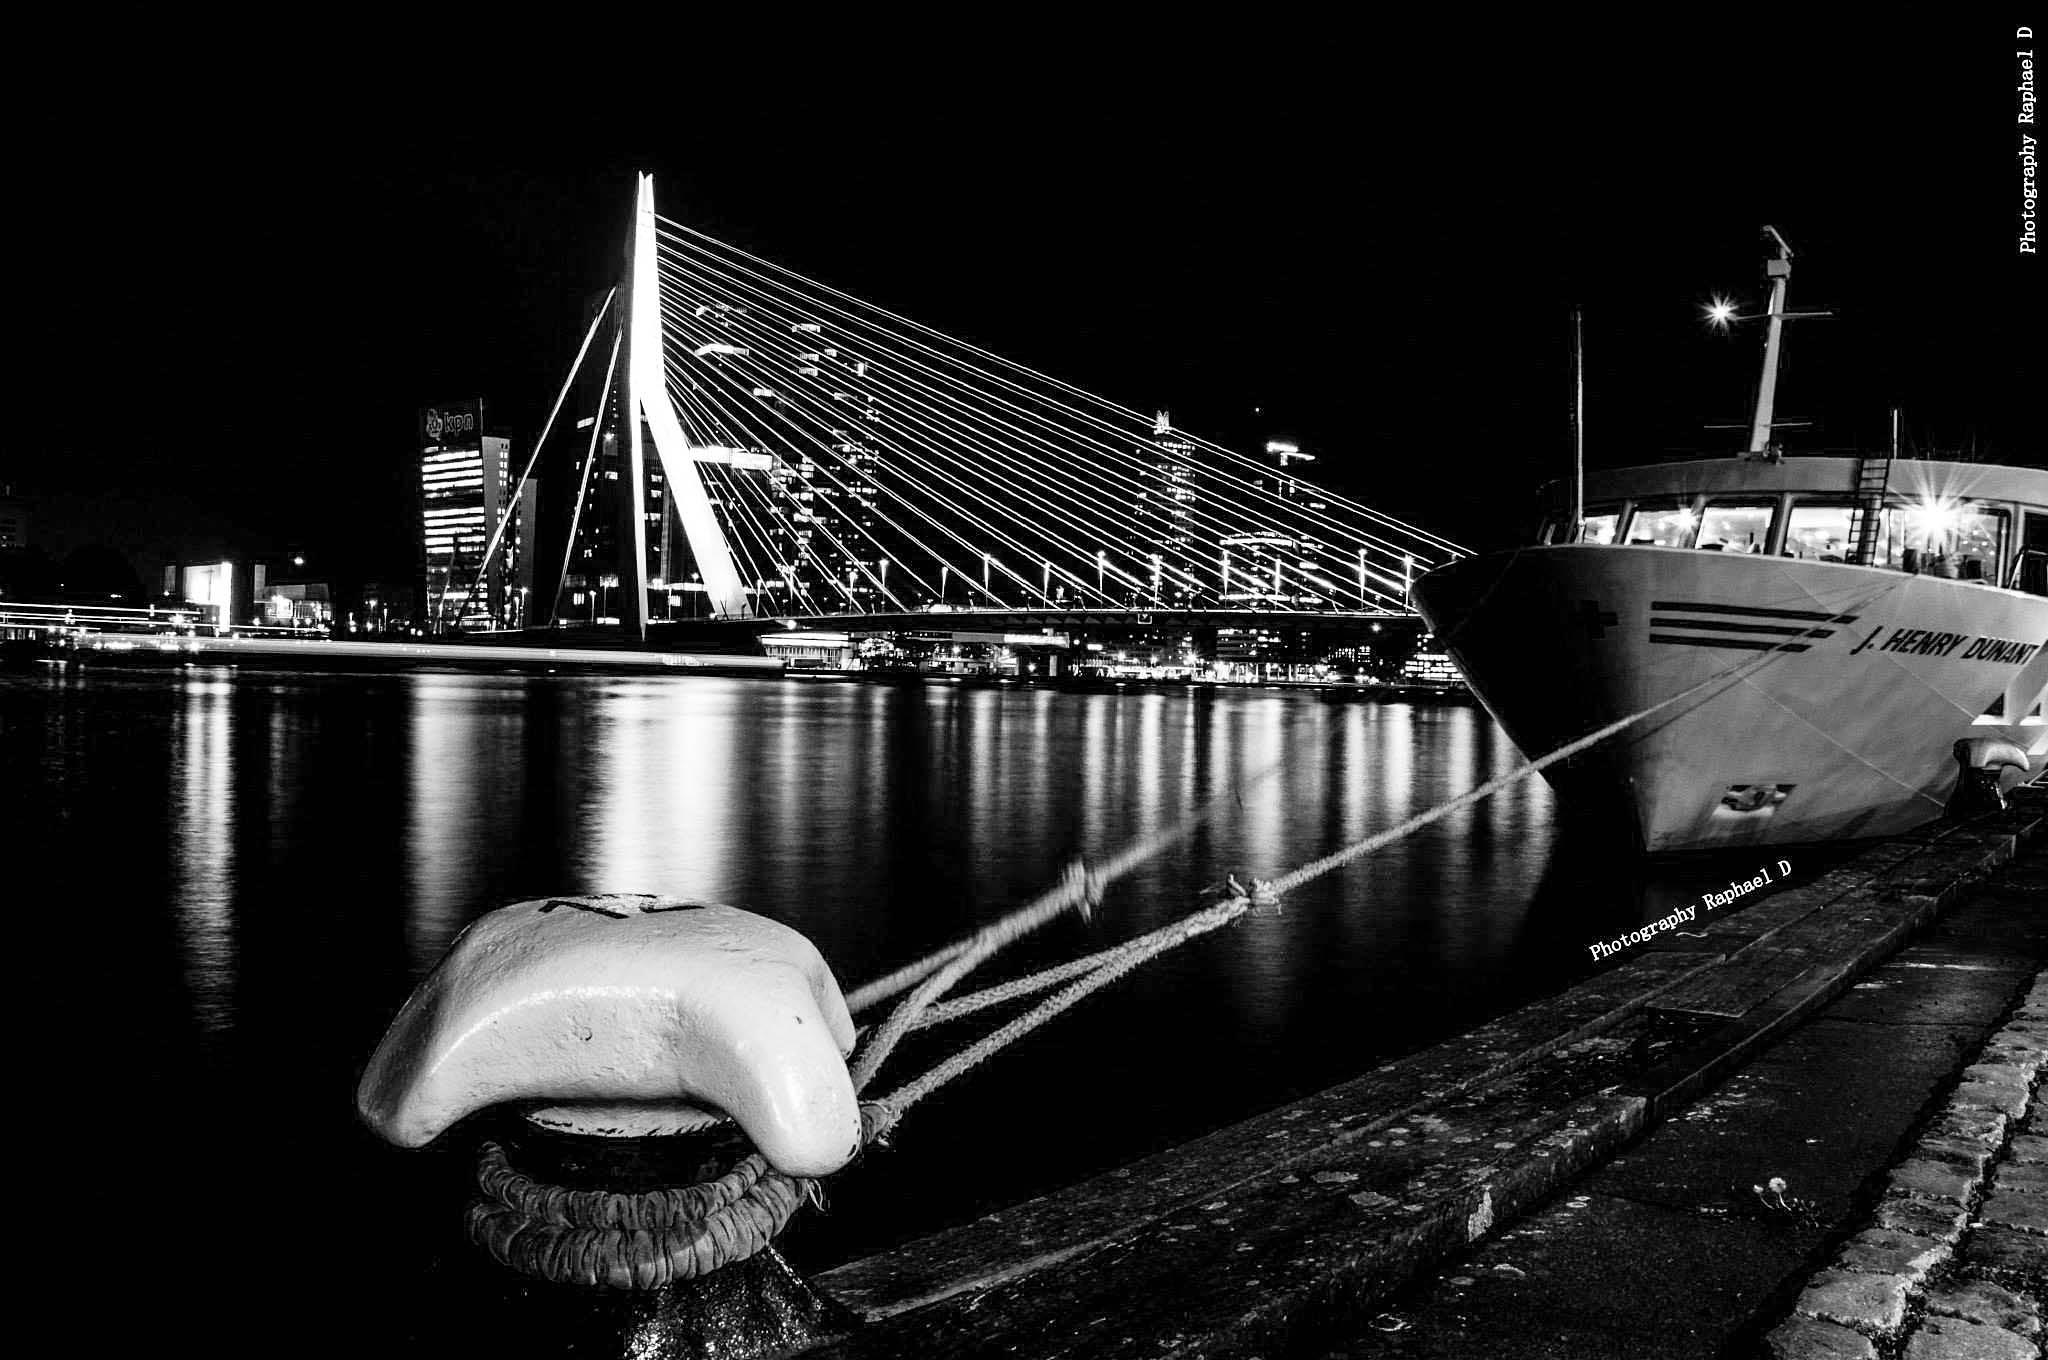 Port of Rotterdam Black and White by Rafał GIERCZAK  ©